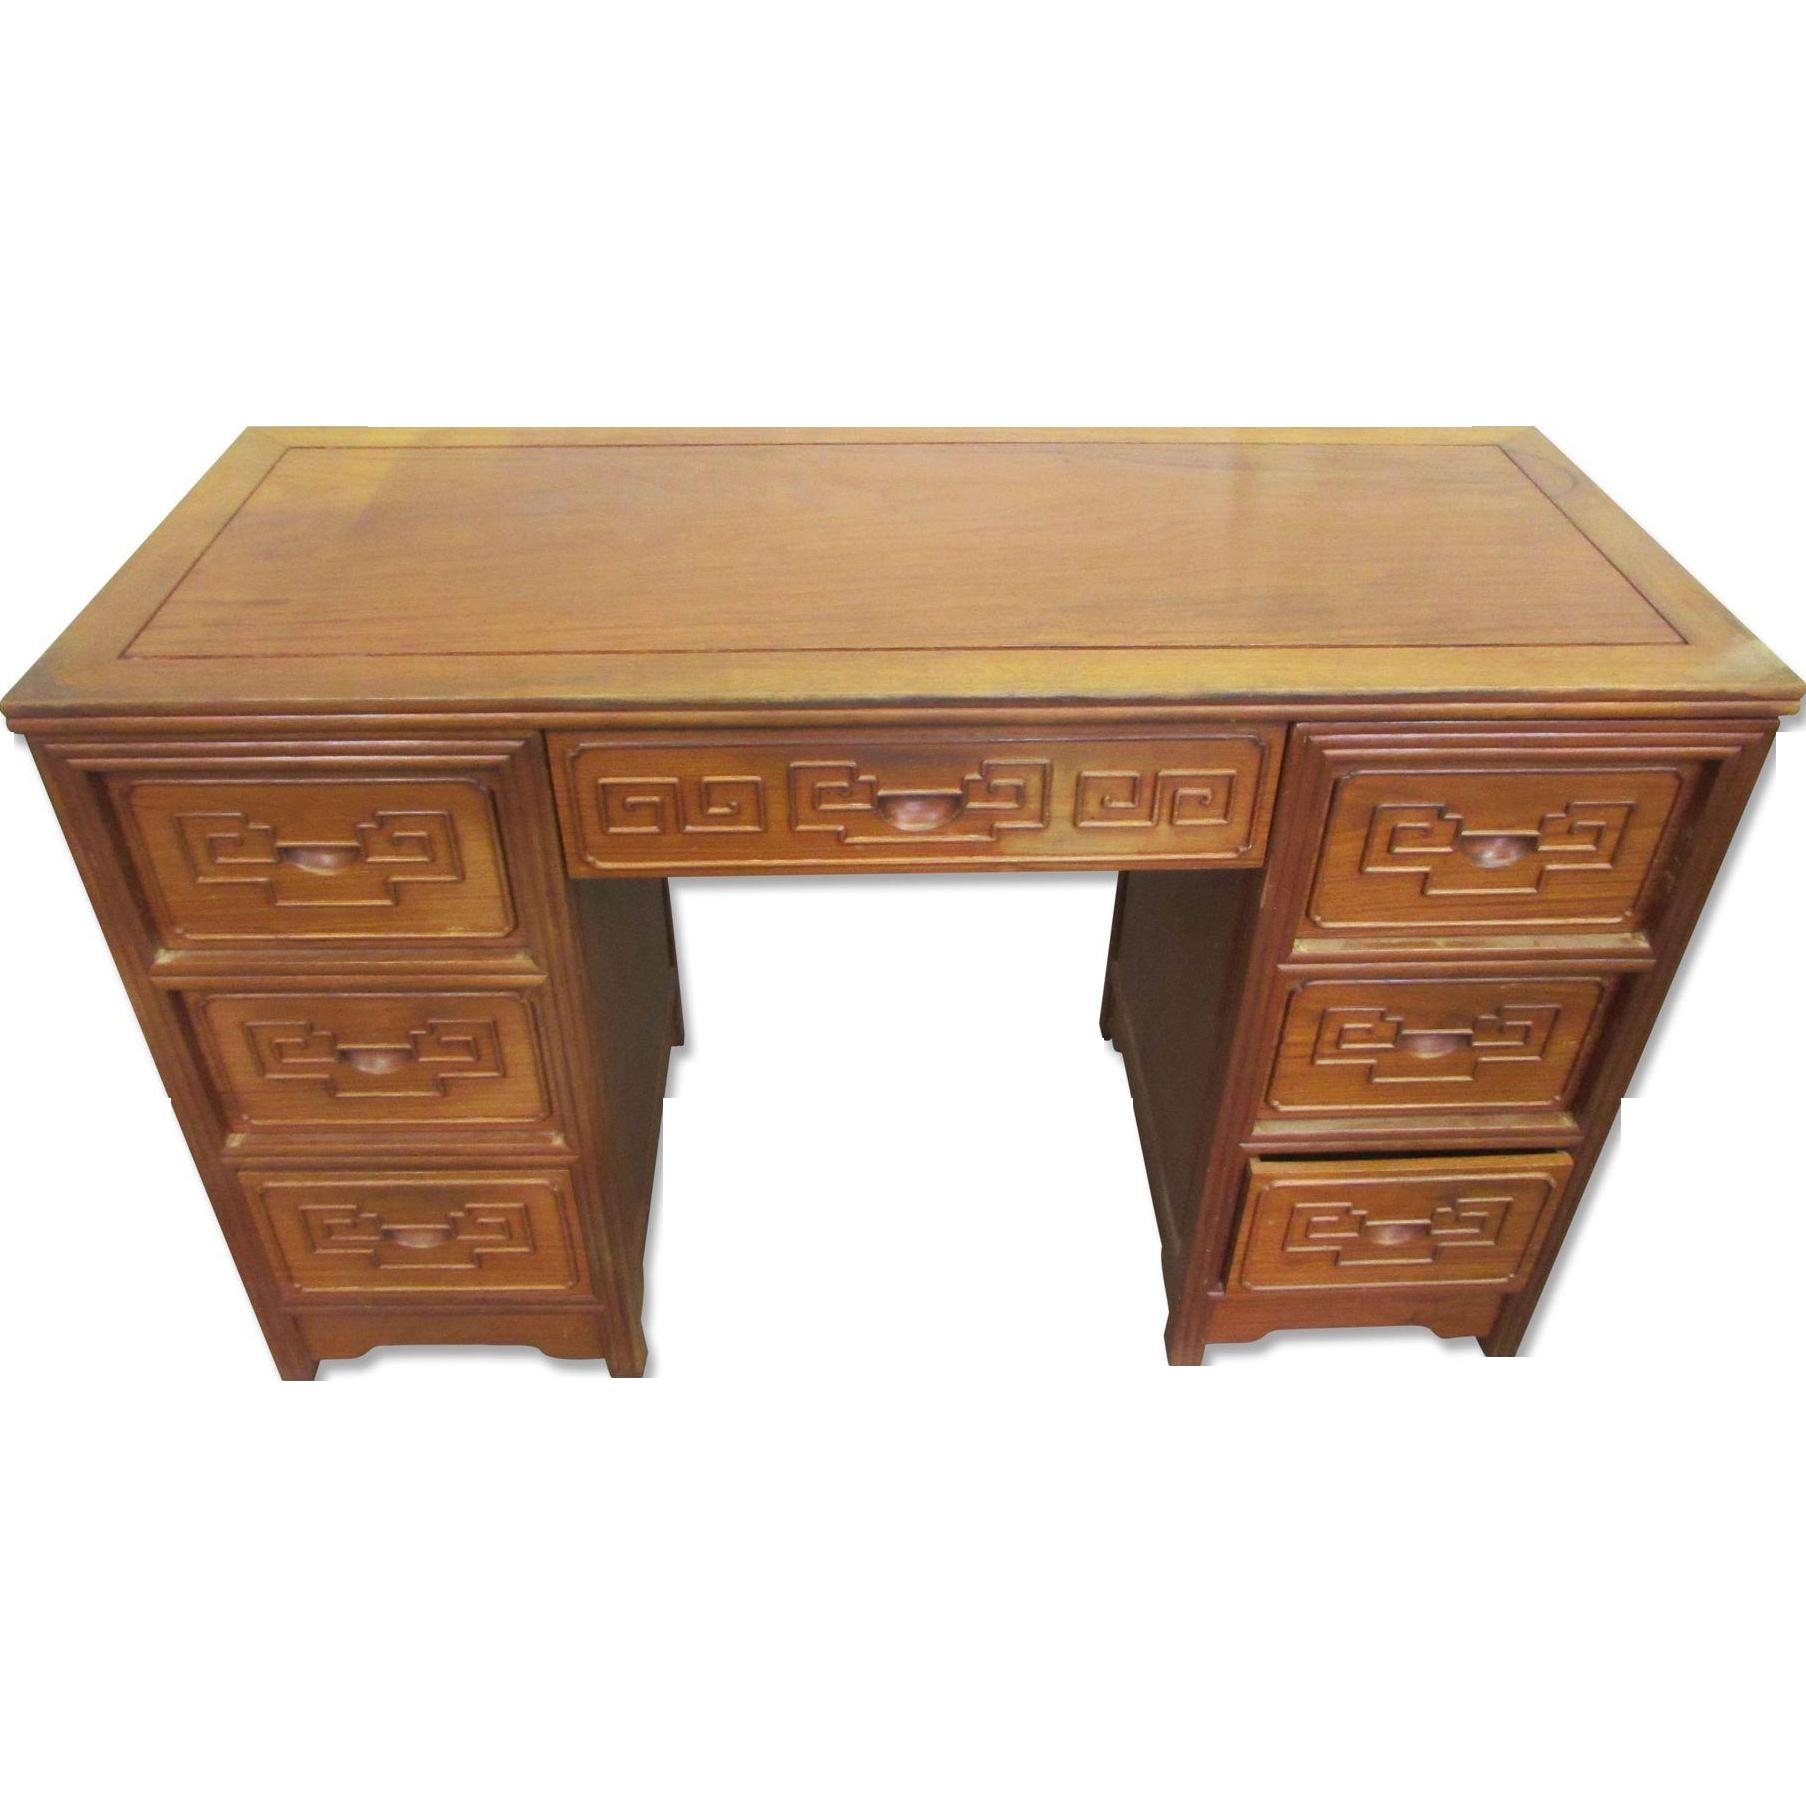 Mid century desk with Greek details